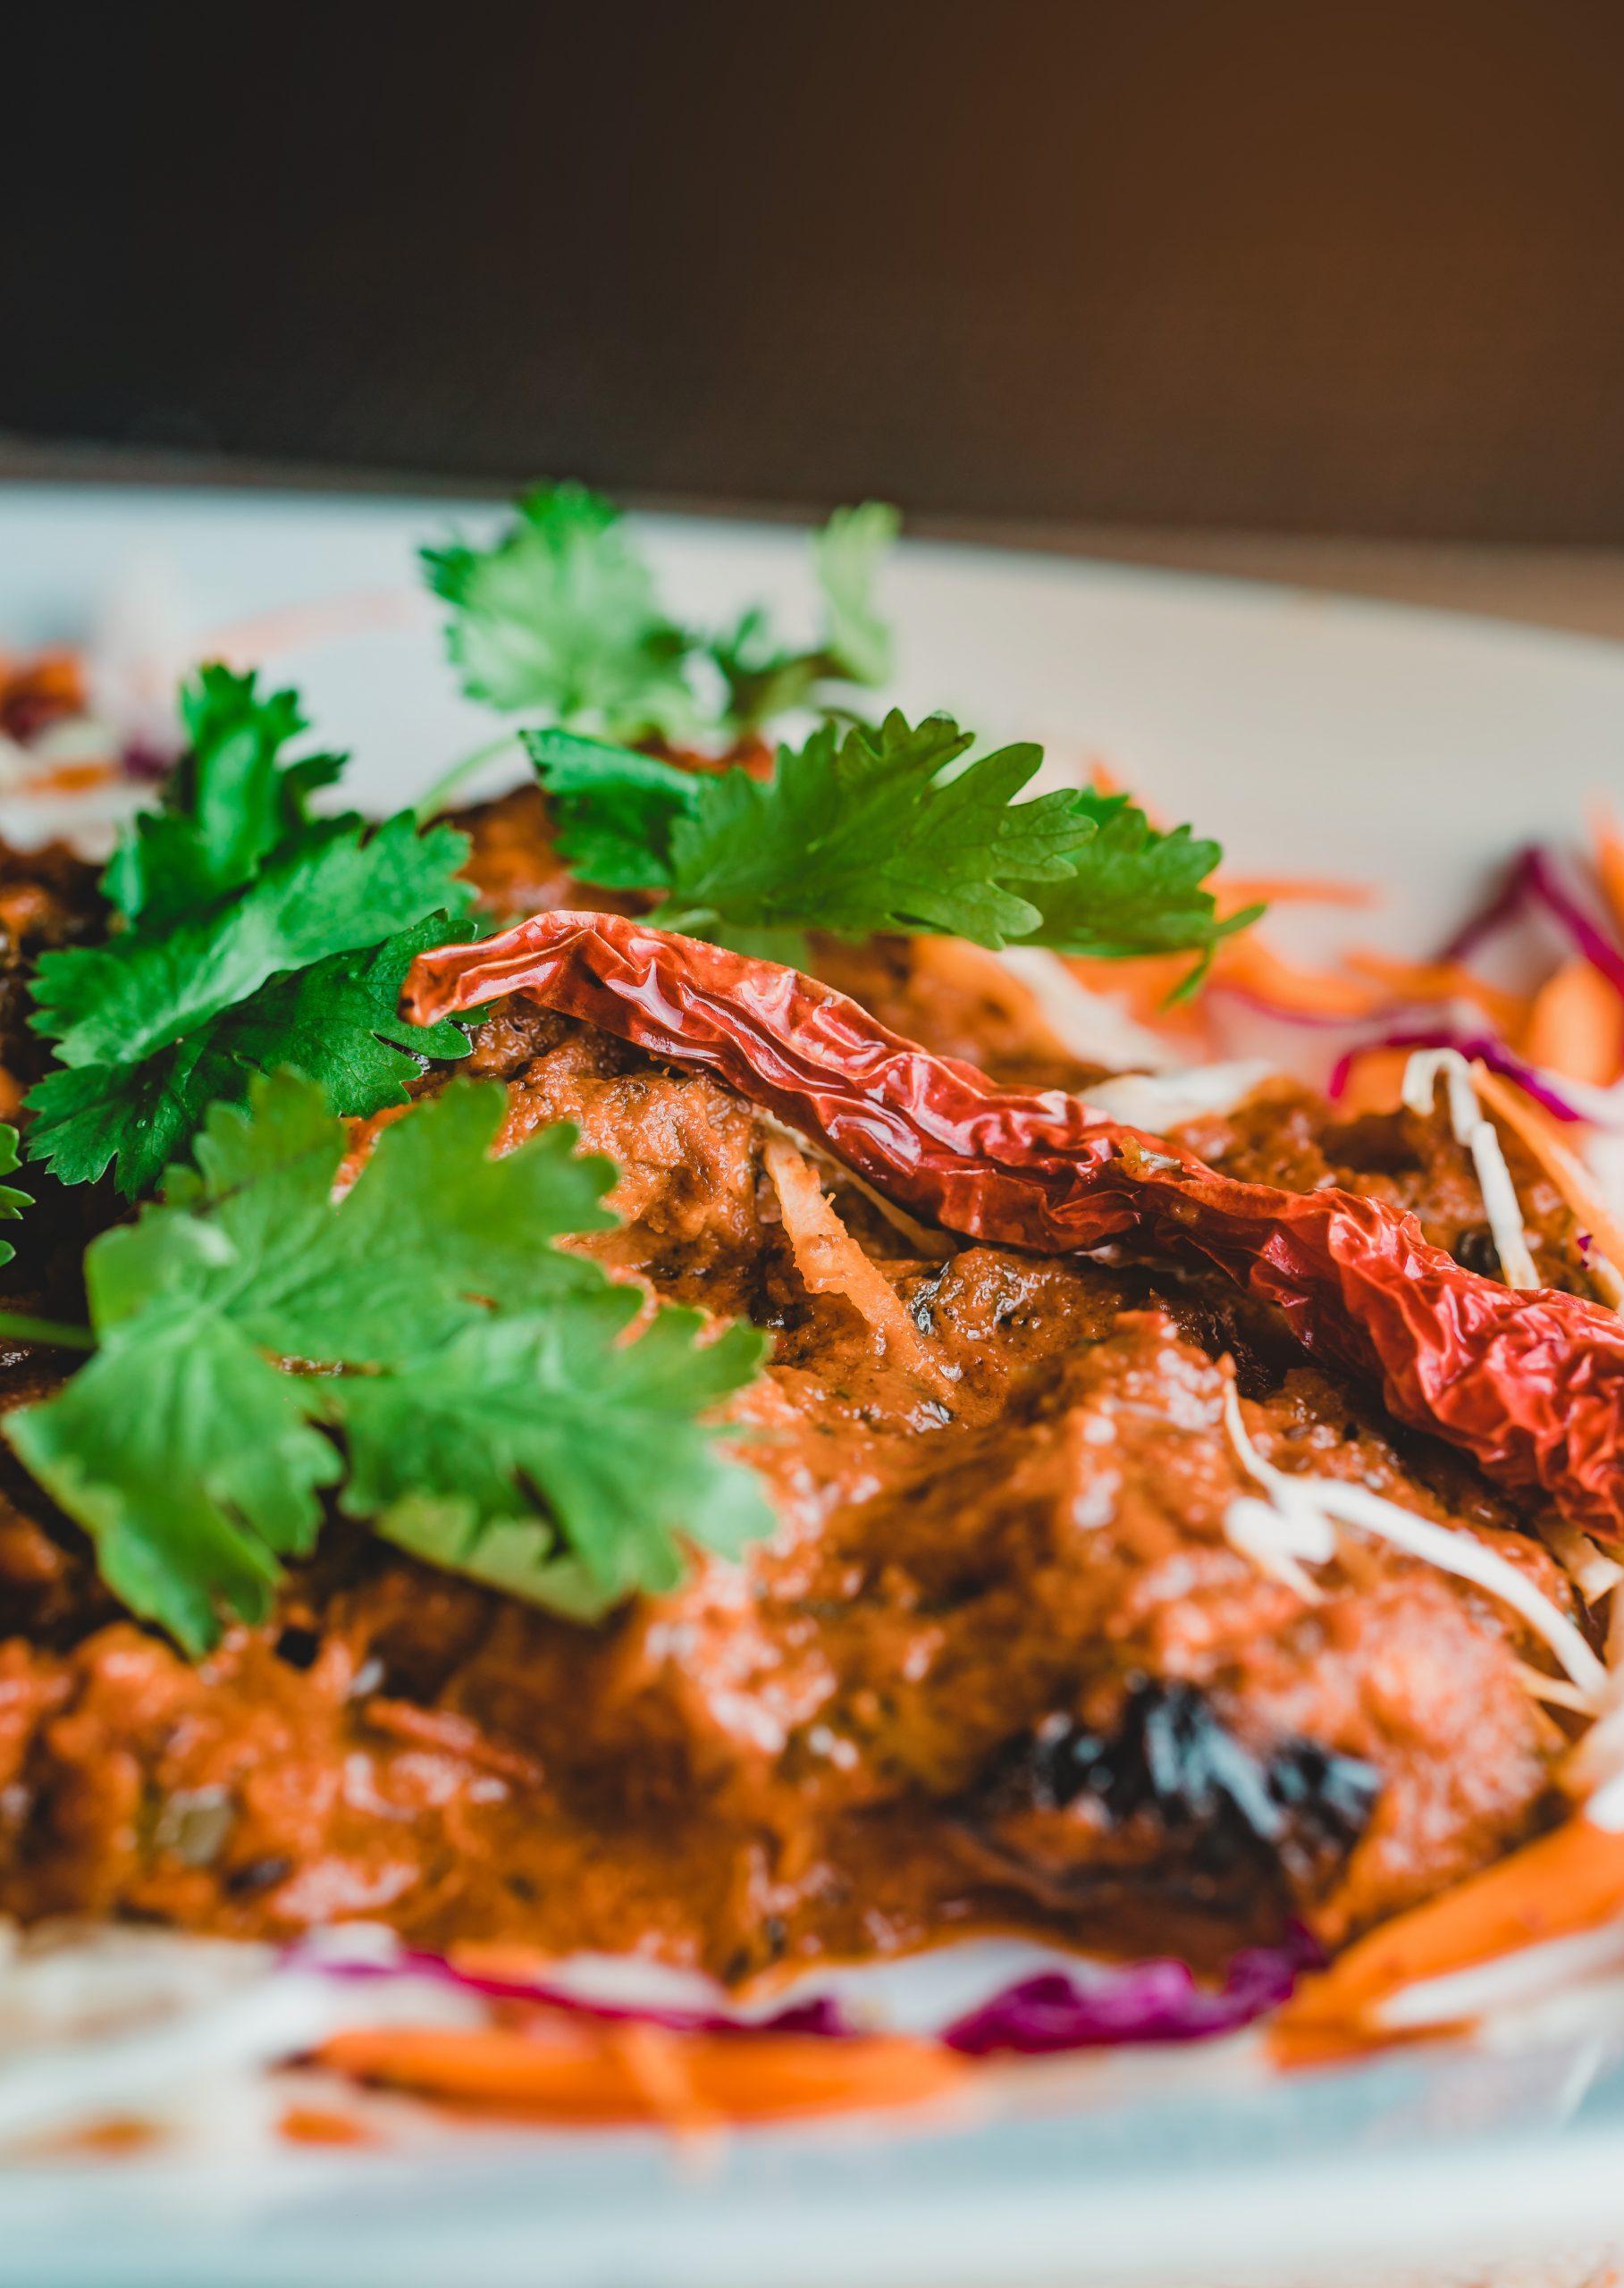 Spicy food dish